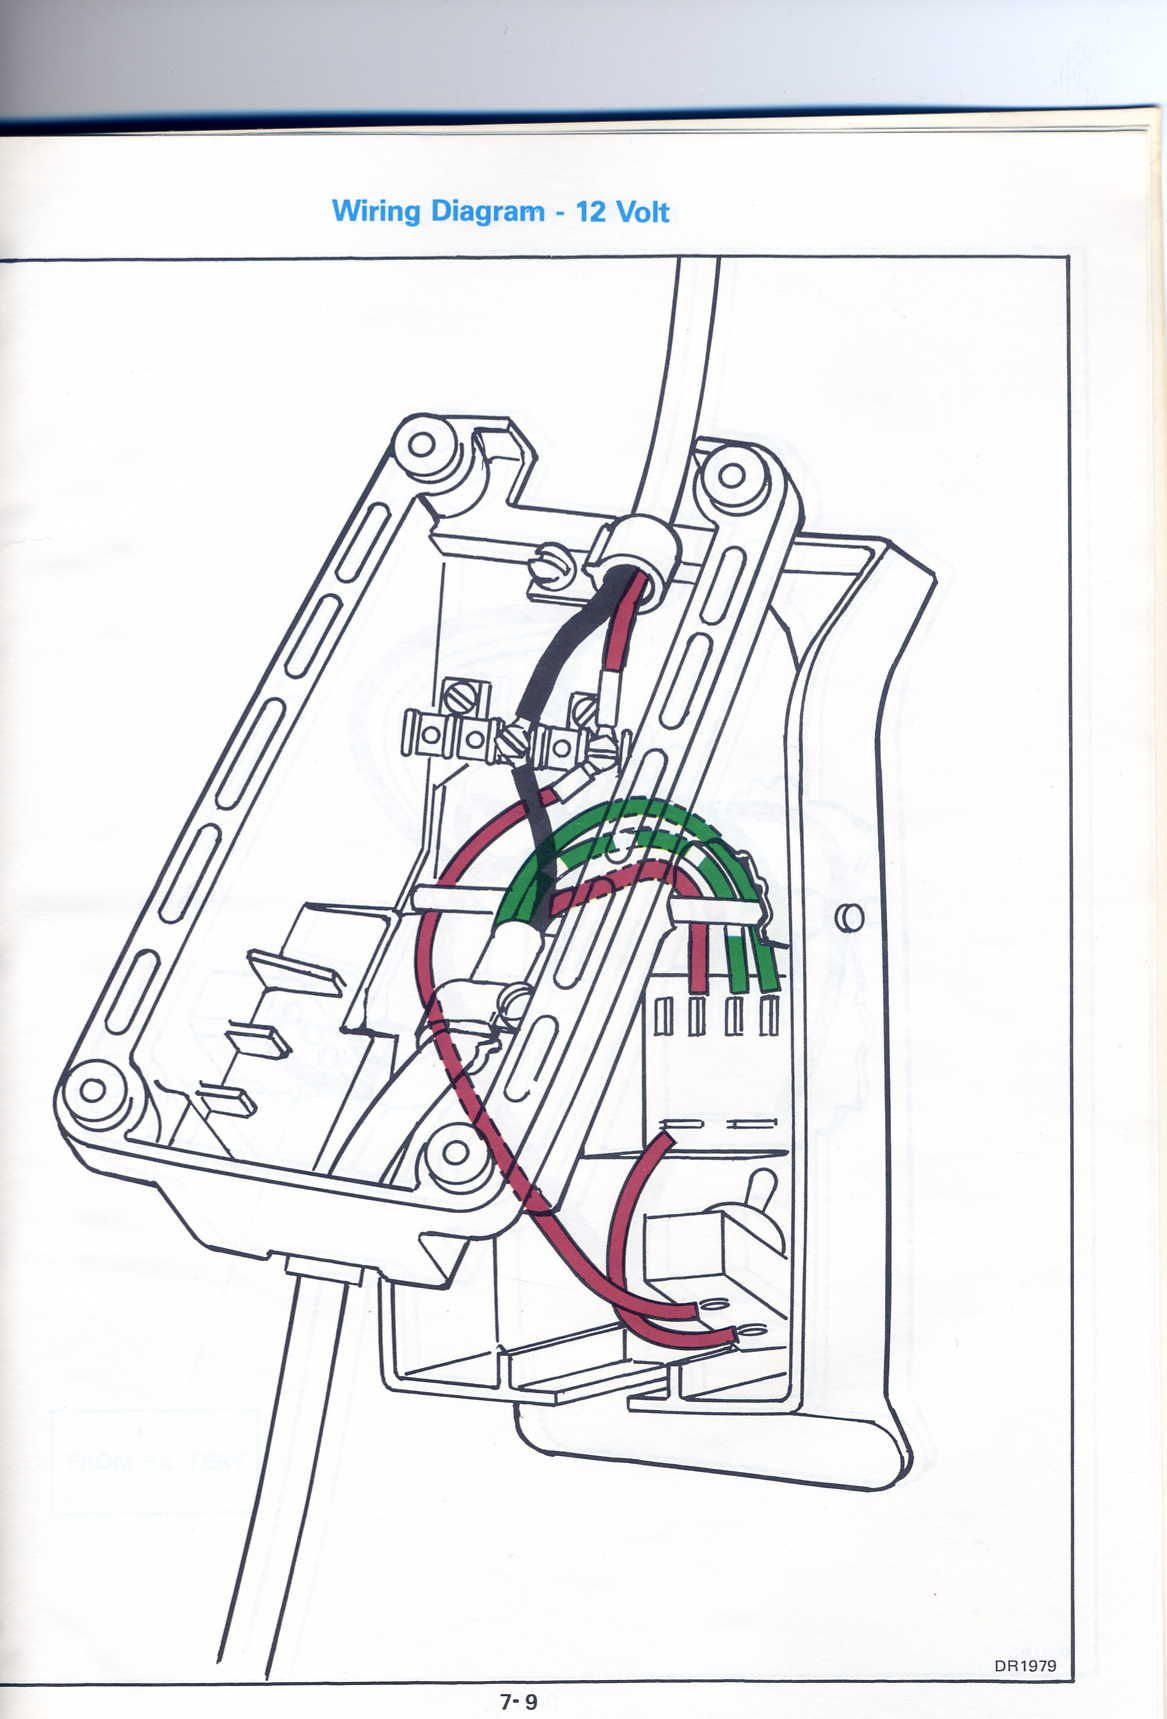 medium resolution of motorguide trolling motor wiring diagram trying to repair a friendstrolling motor foot pedel wiring diagram